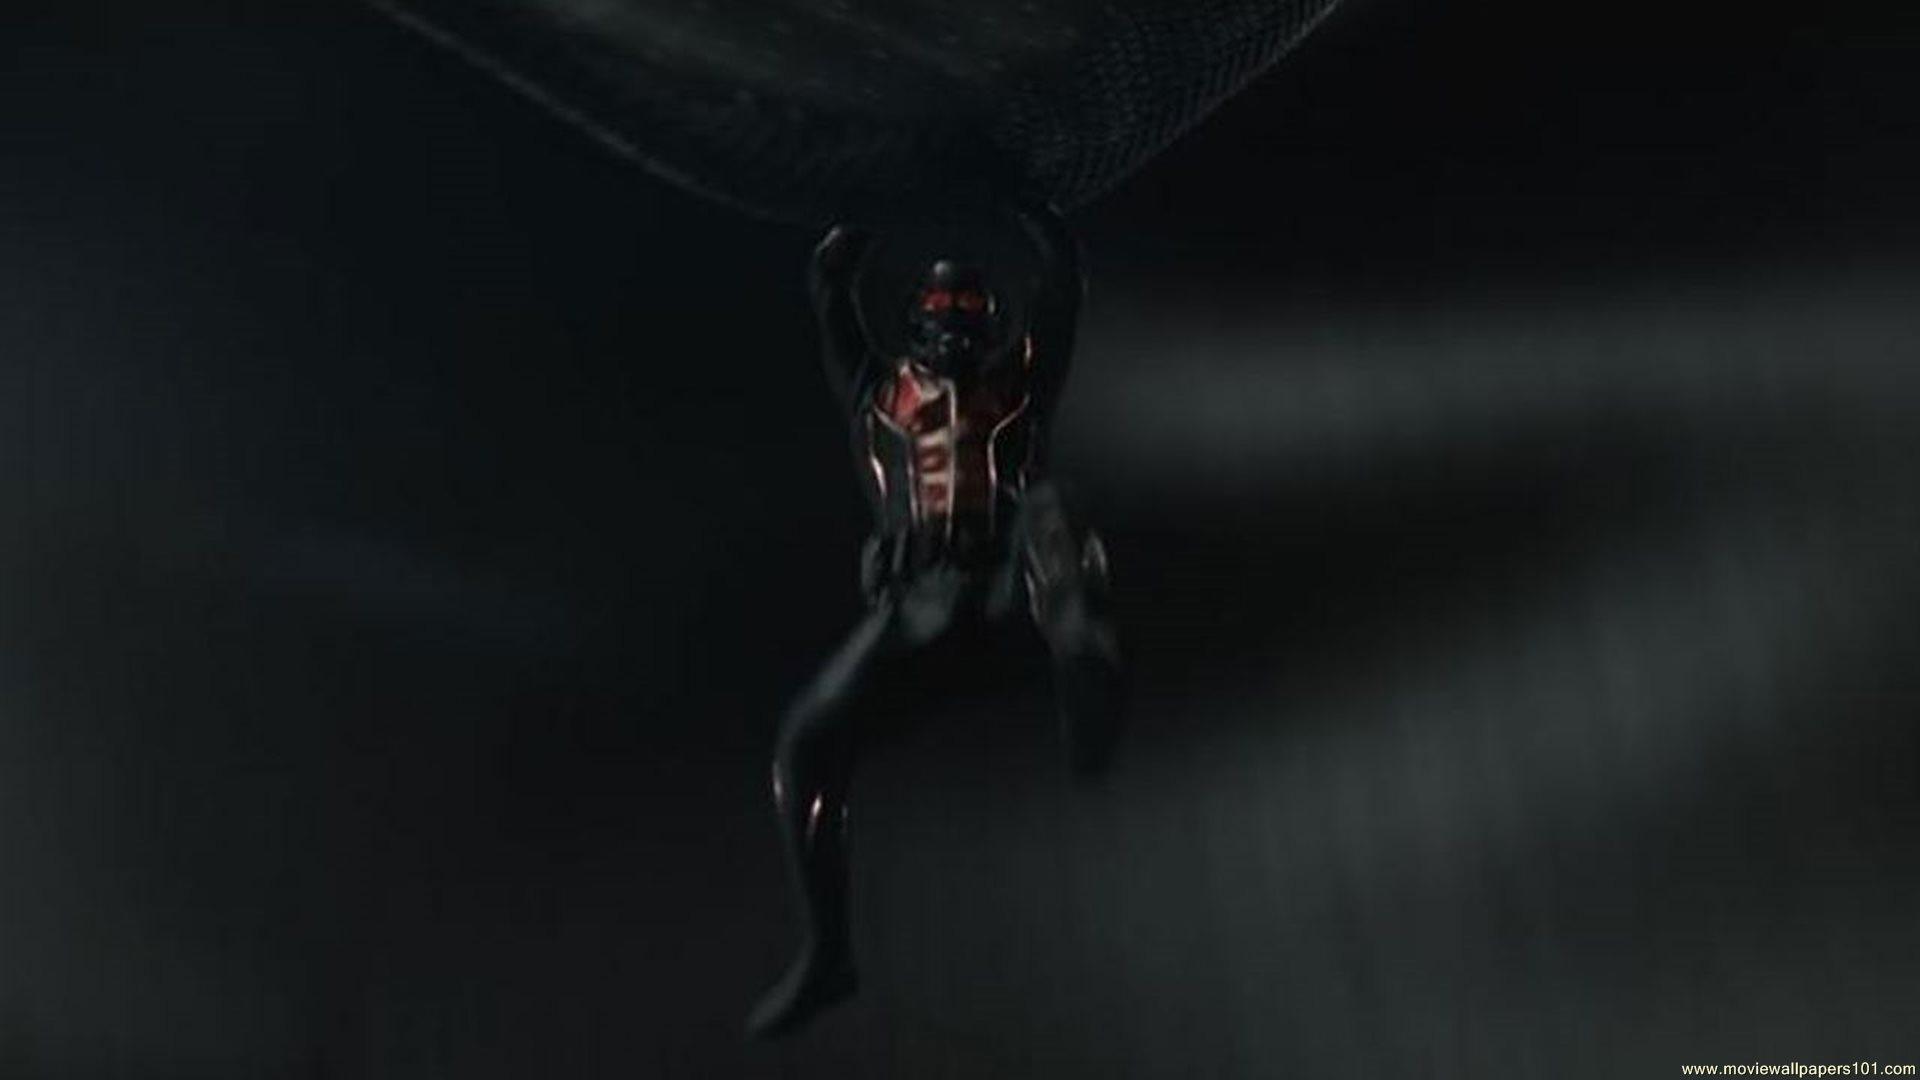 Ant Man Retina Movie Wallpaper: Ant Man IPhone Wallpaper